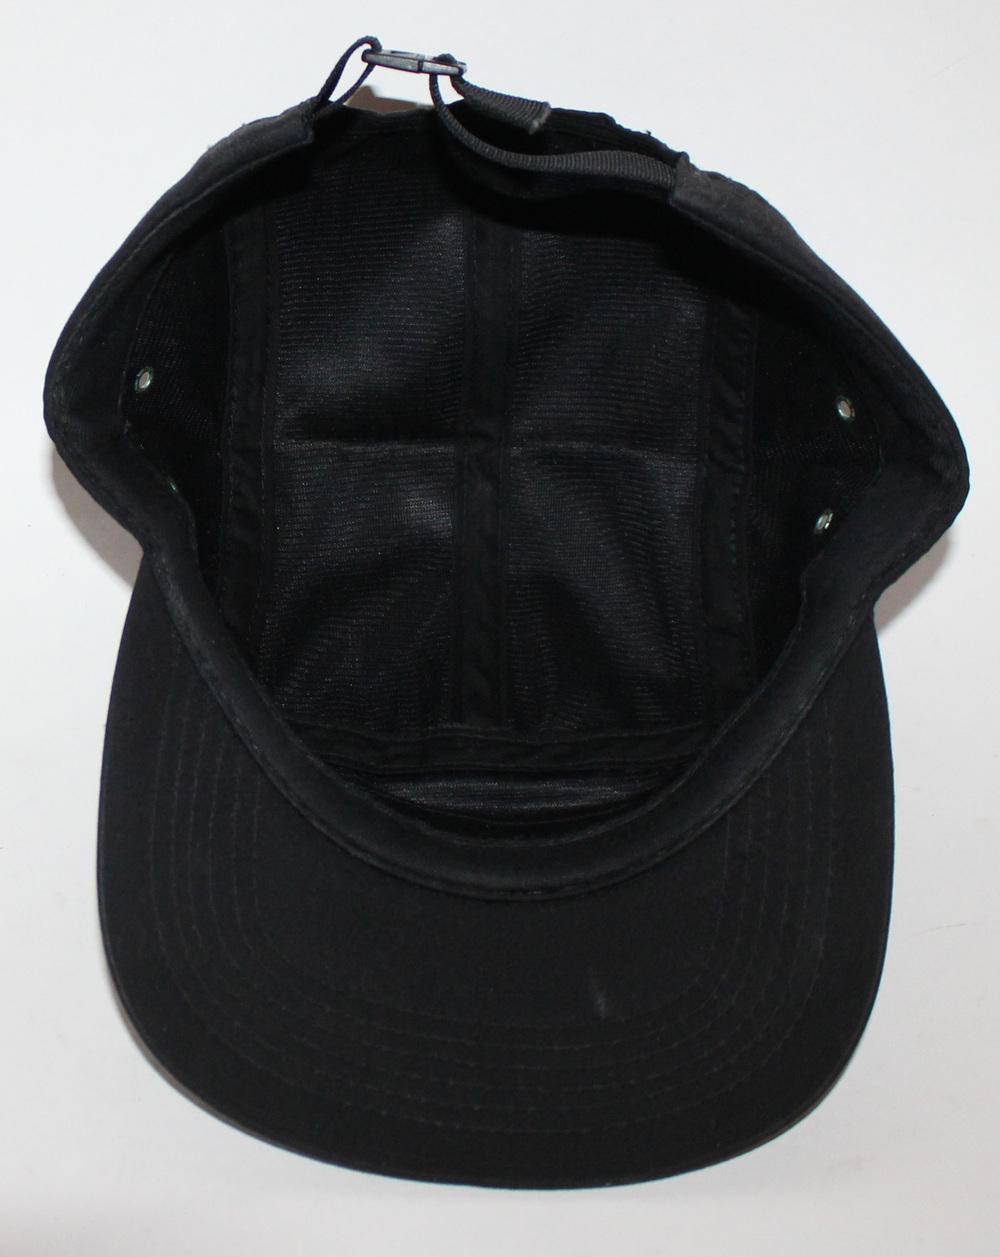 8ddedacf215 Supreme Black 5 Panel Ripstop Camp Hat F W 10 — Roots